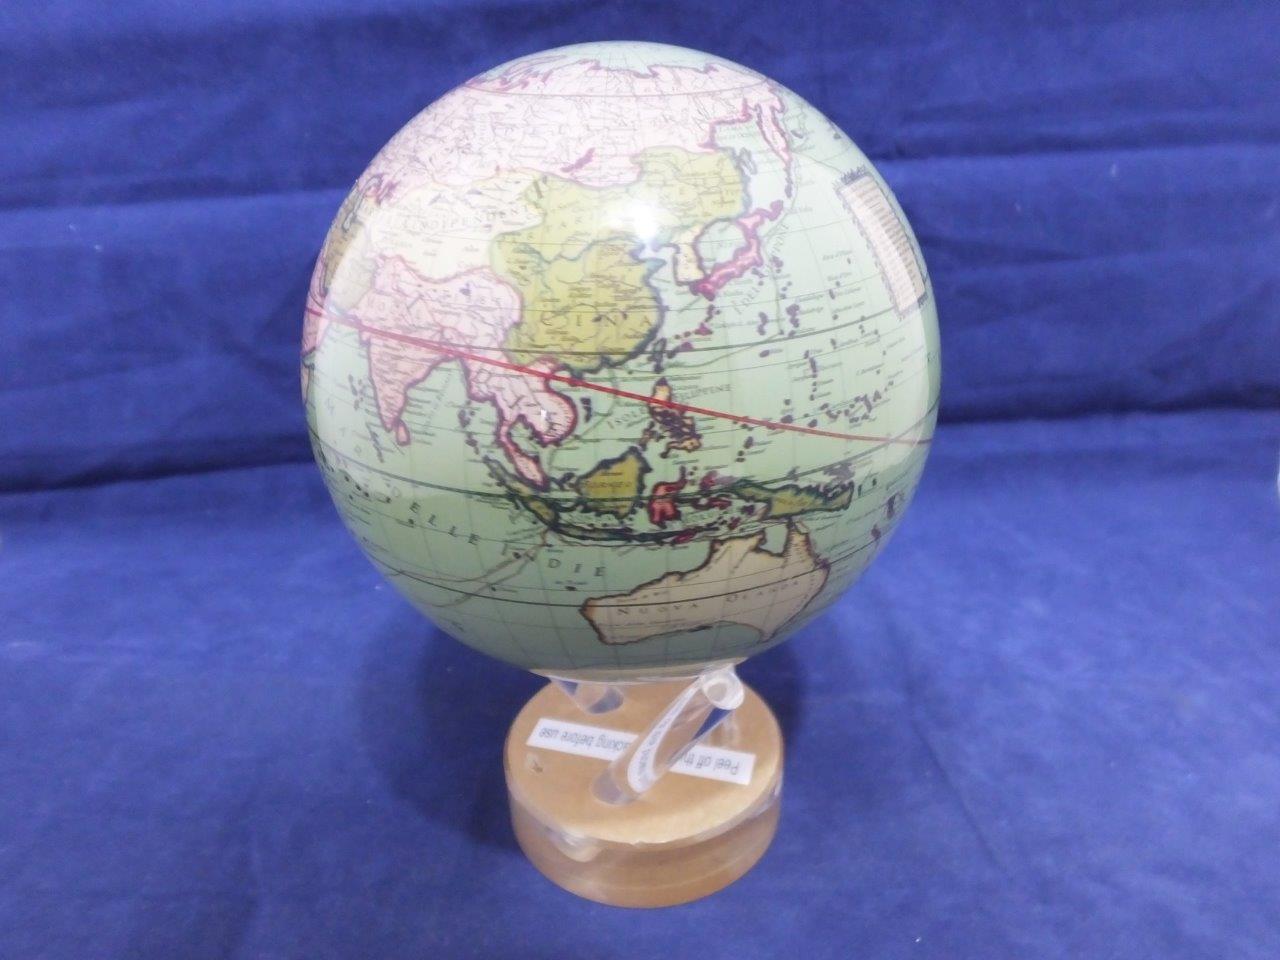 MOVA mapeo Antiguo verde 4.5 pulgadas globo de movimiento.